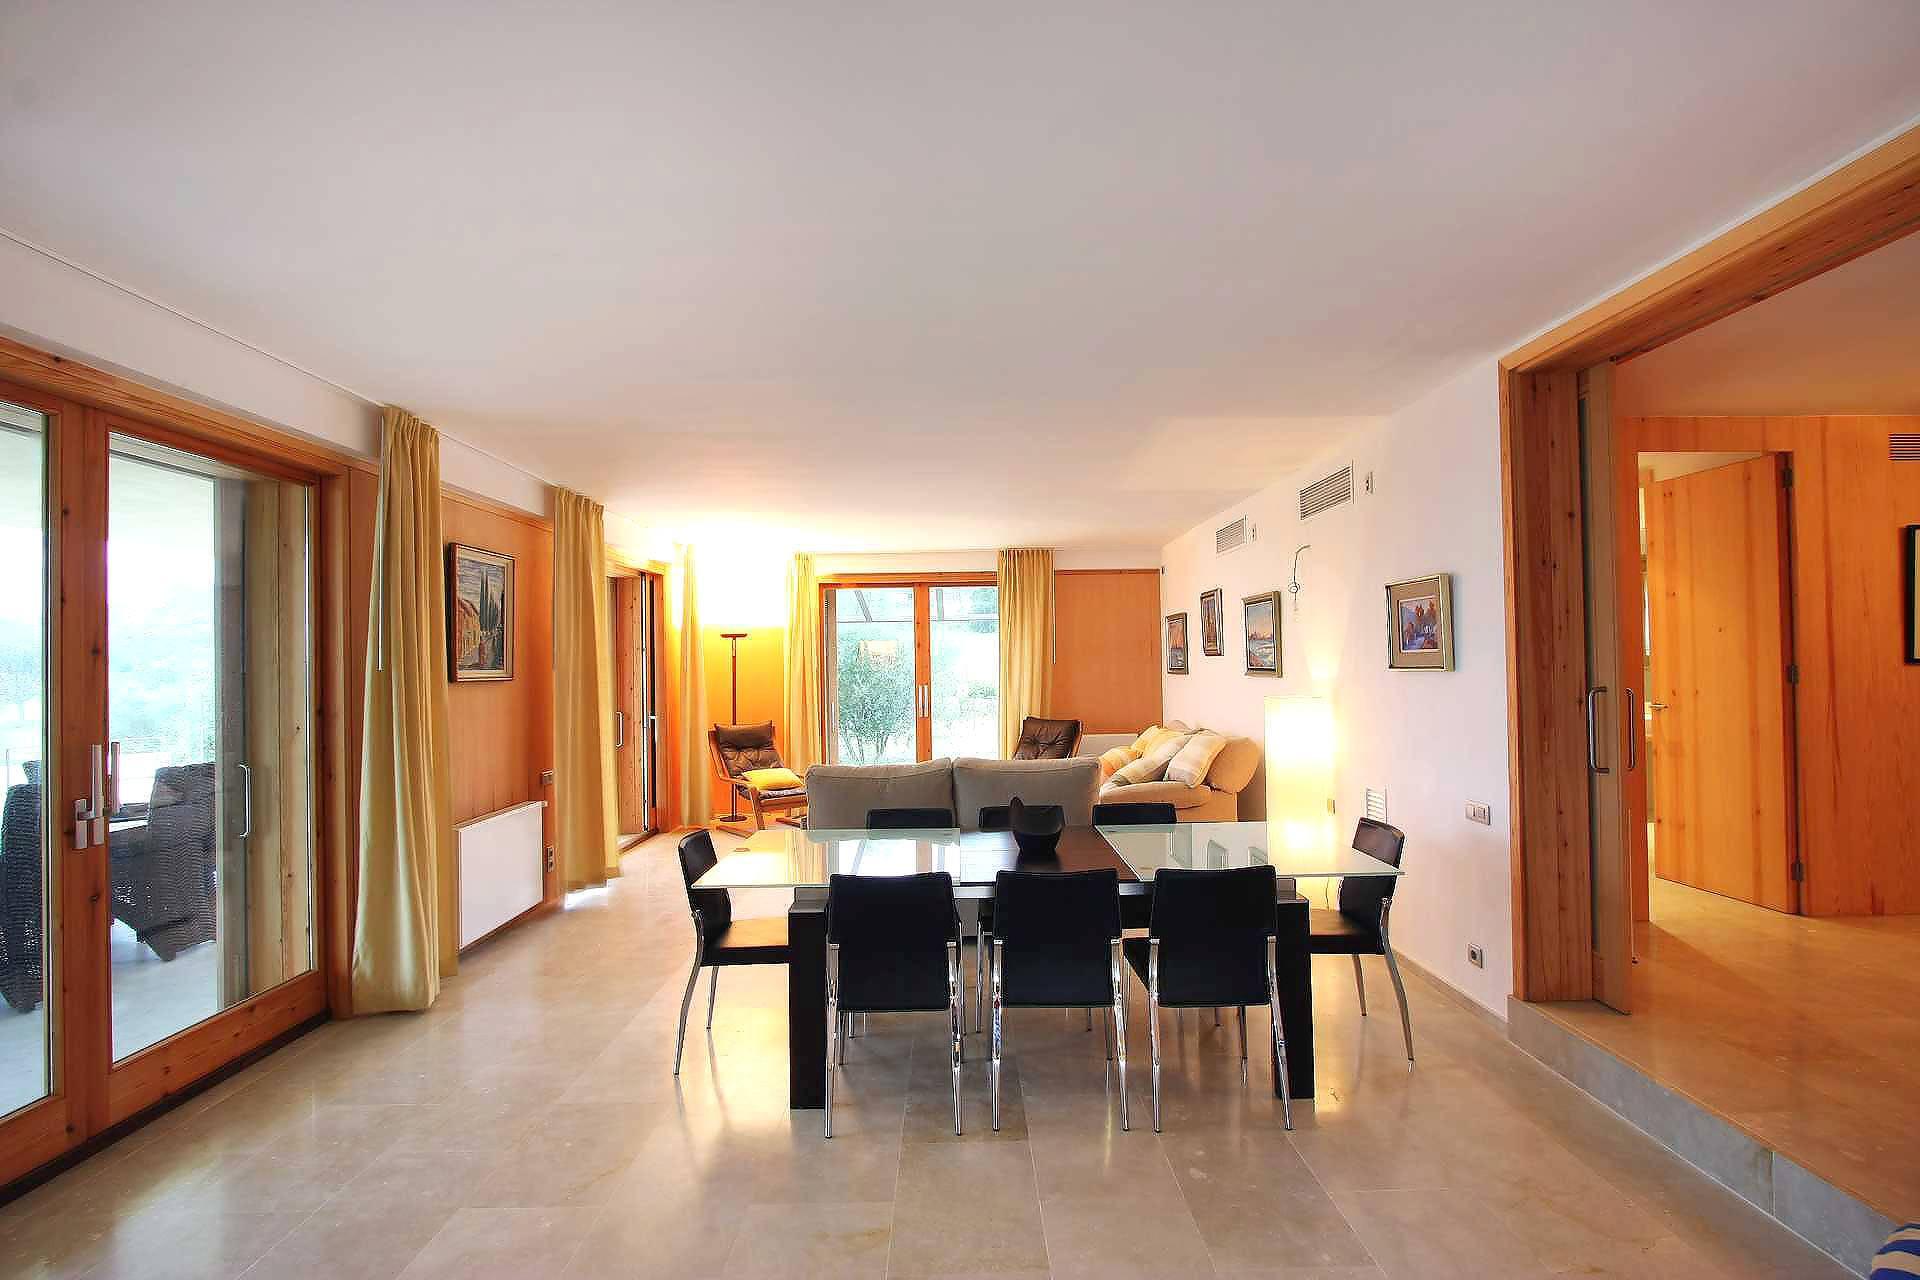 01-36 klassische Villa Mallorca Norden Bild 13